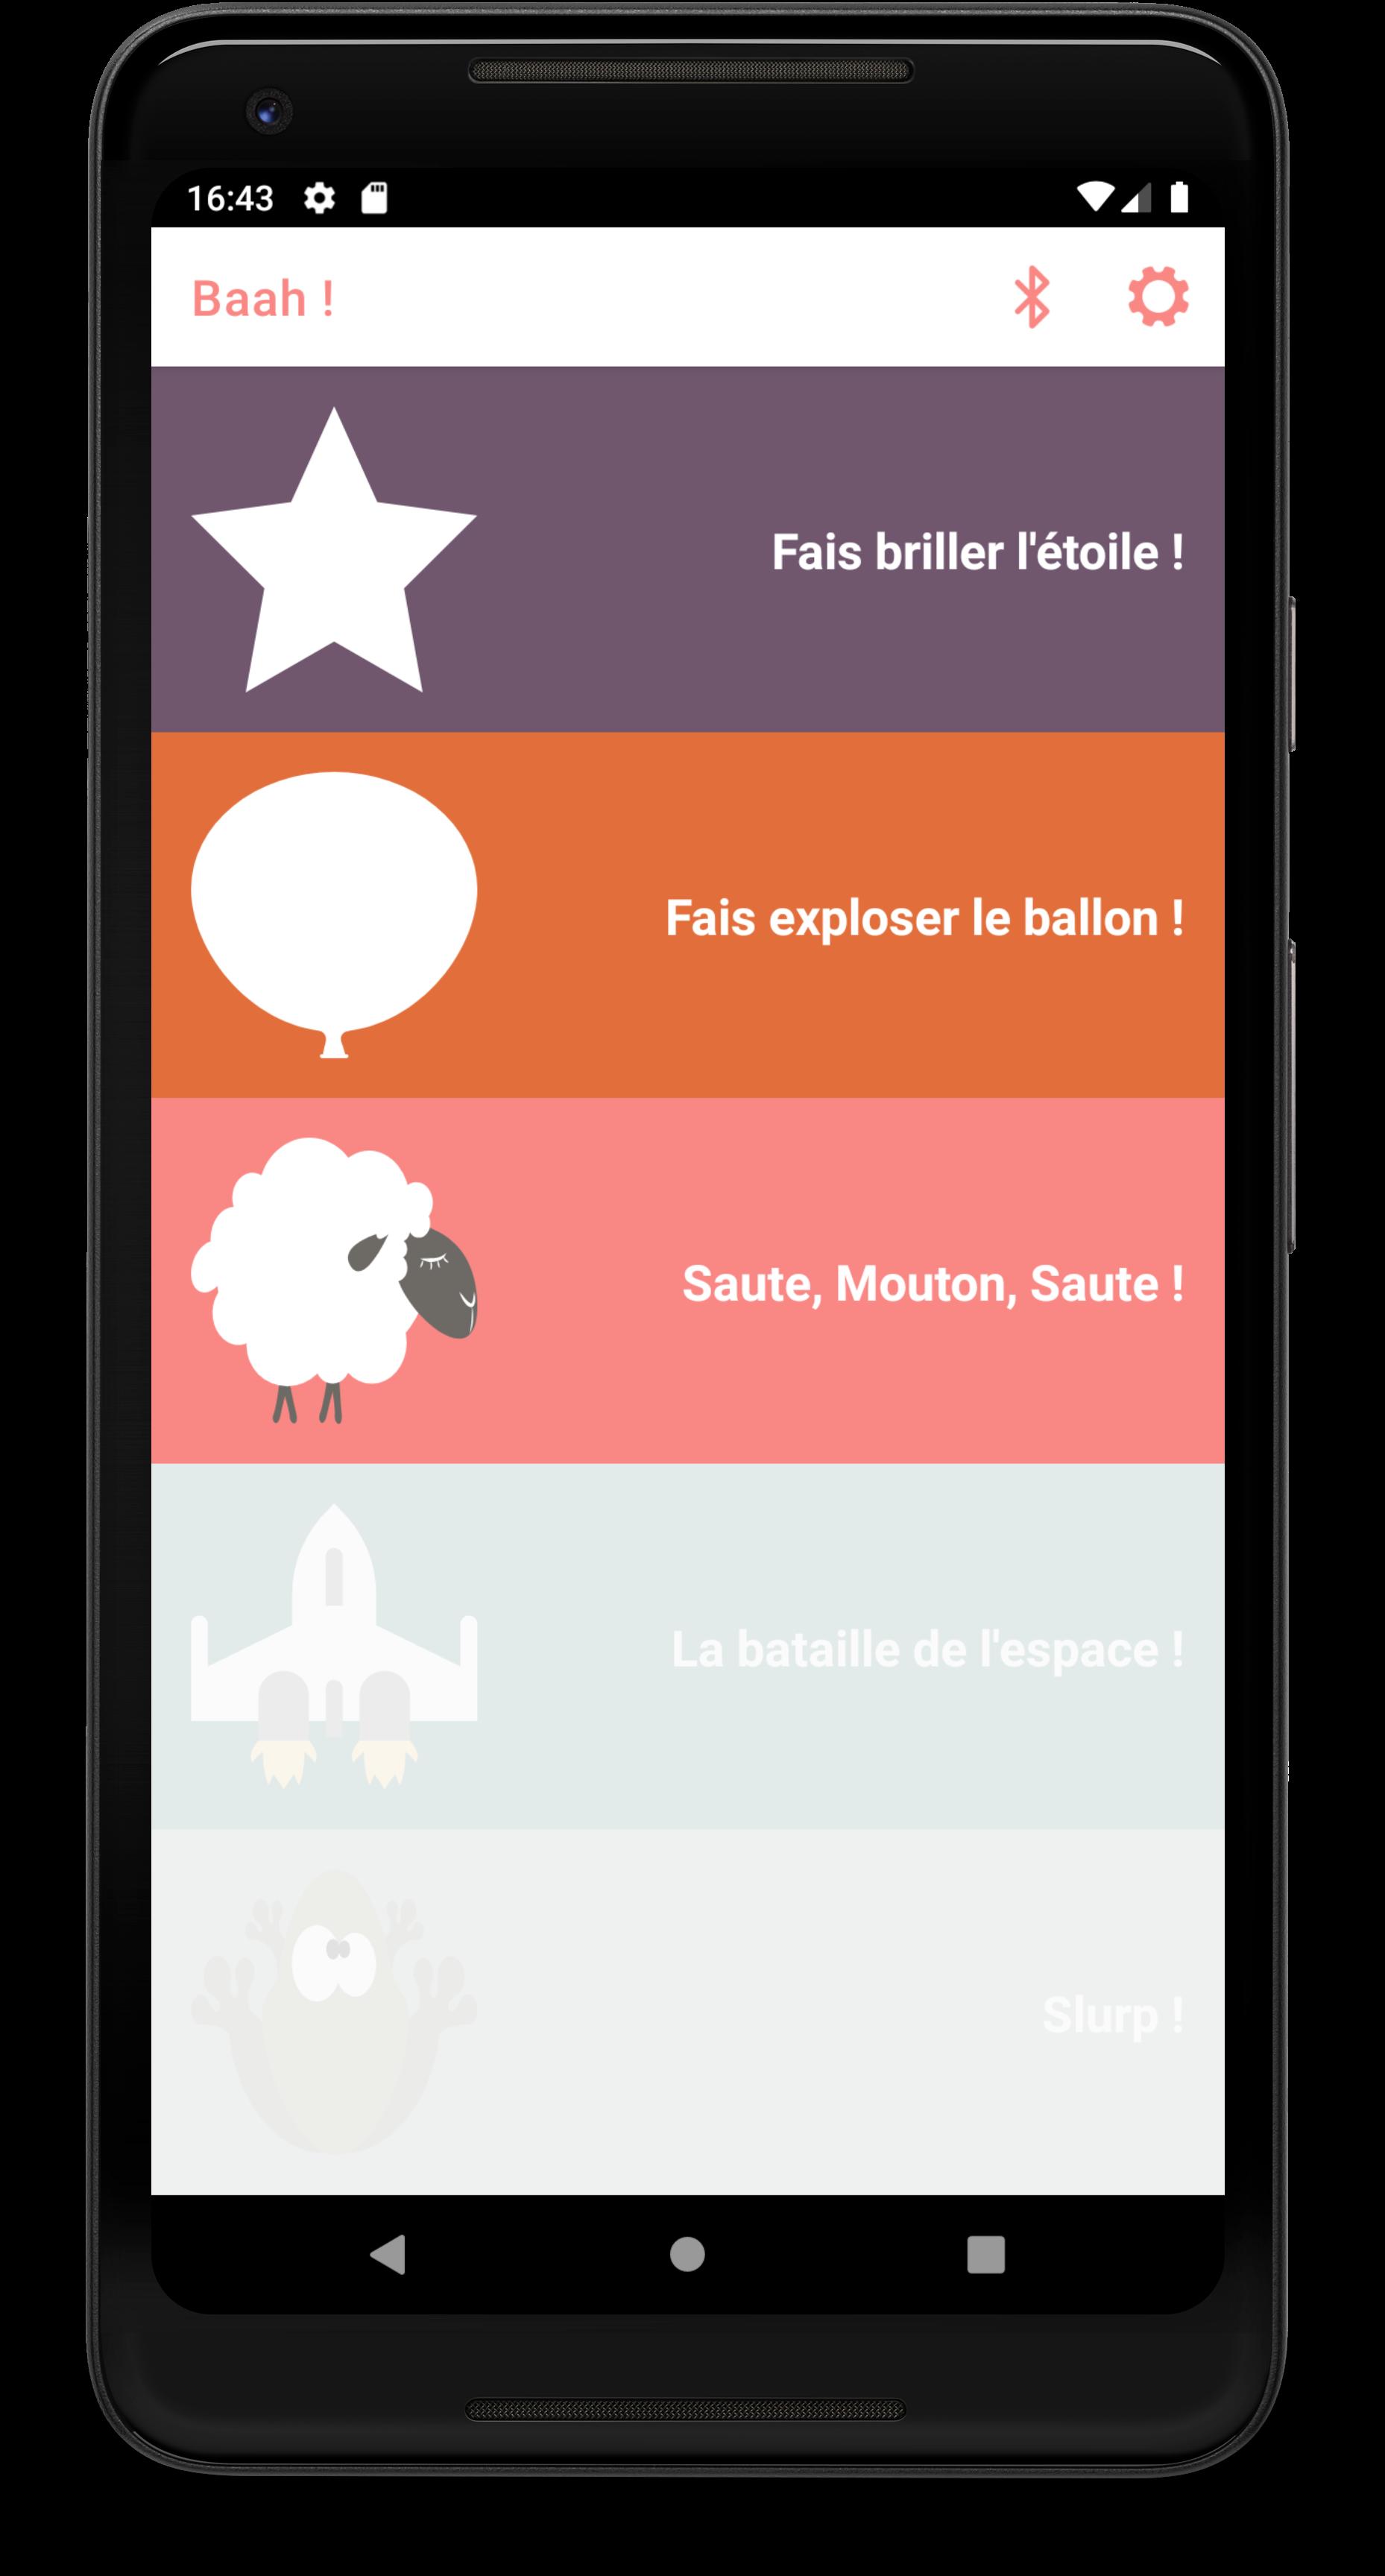 The main menu (version 0.6.0 of the app)